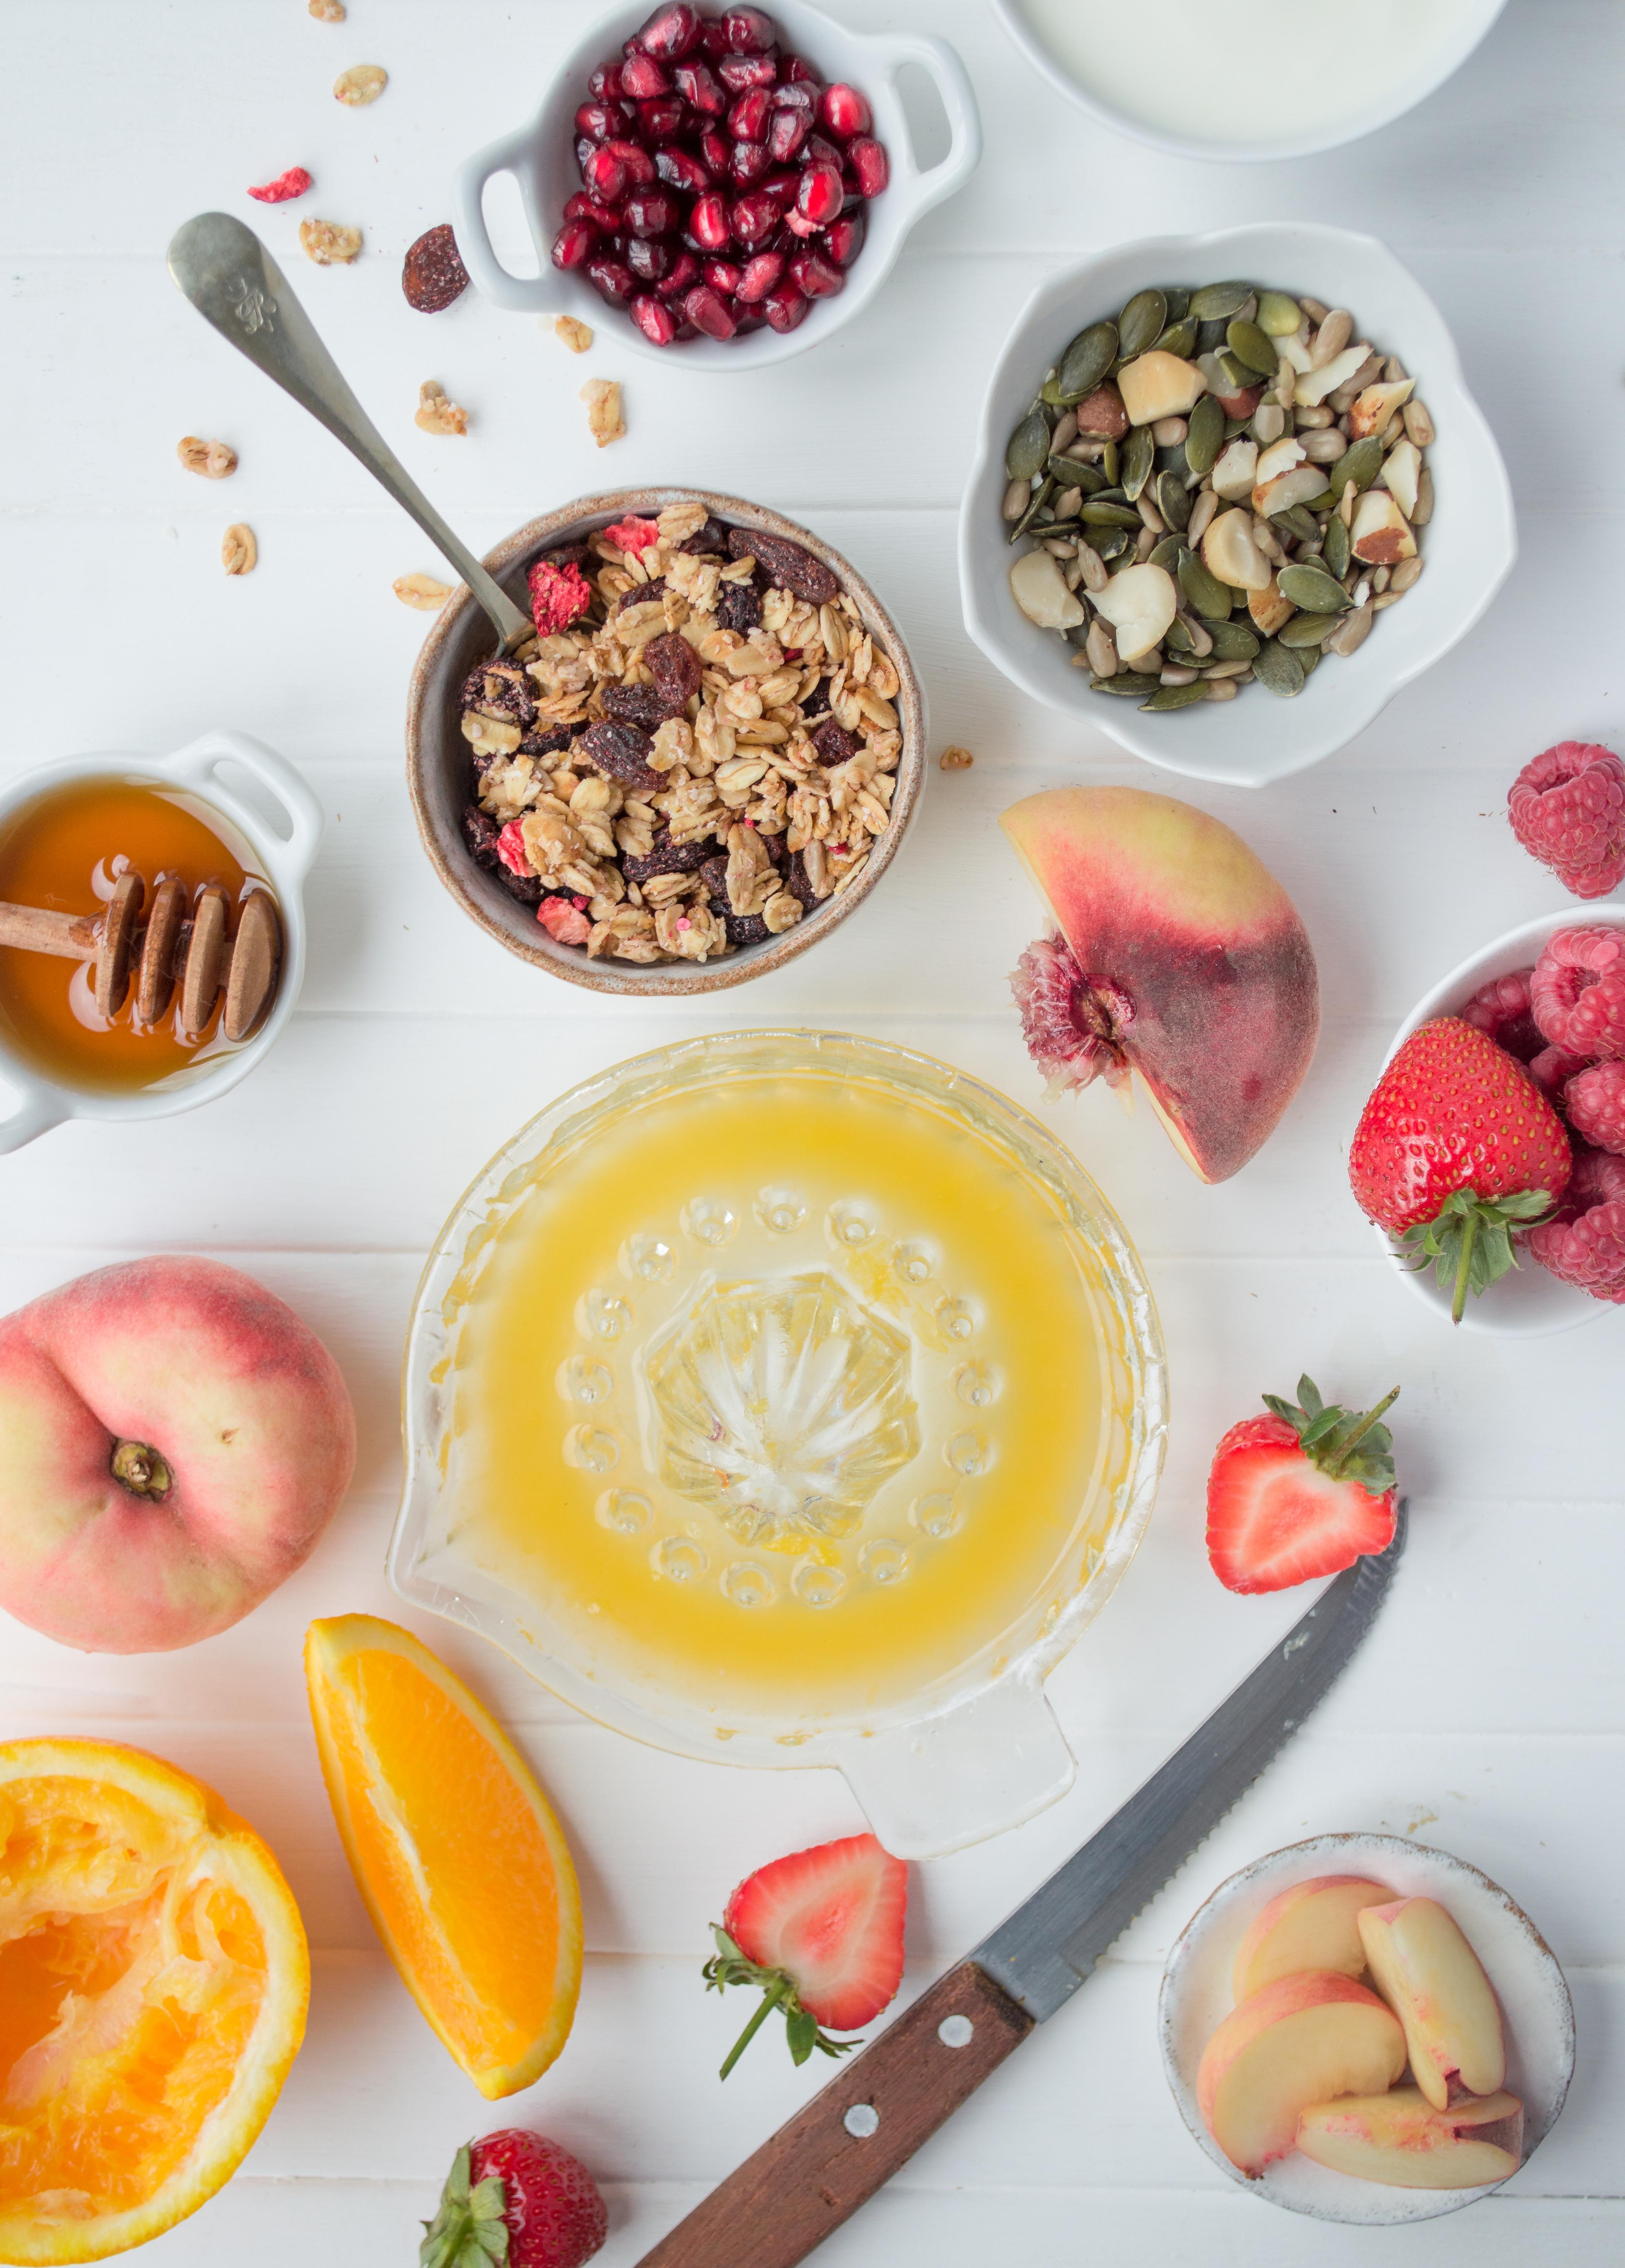 Summer berry crunch #healthybreakfast #breakfastonthego #healthyrecipes